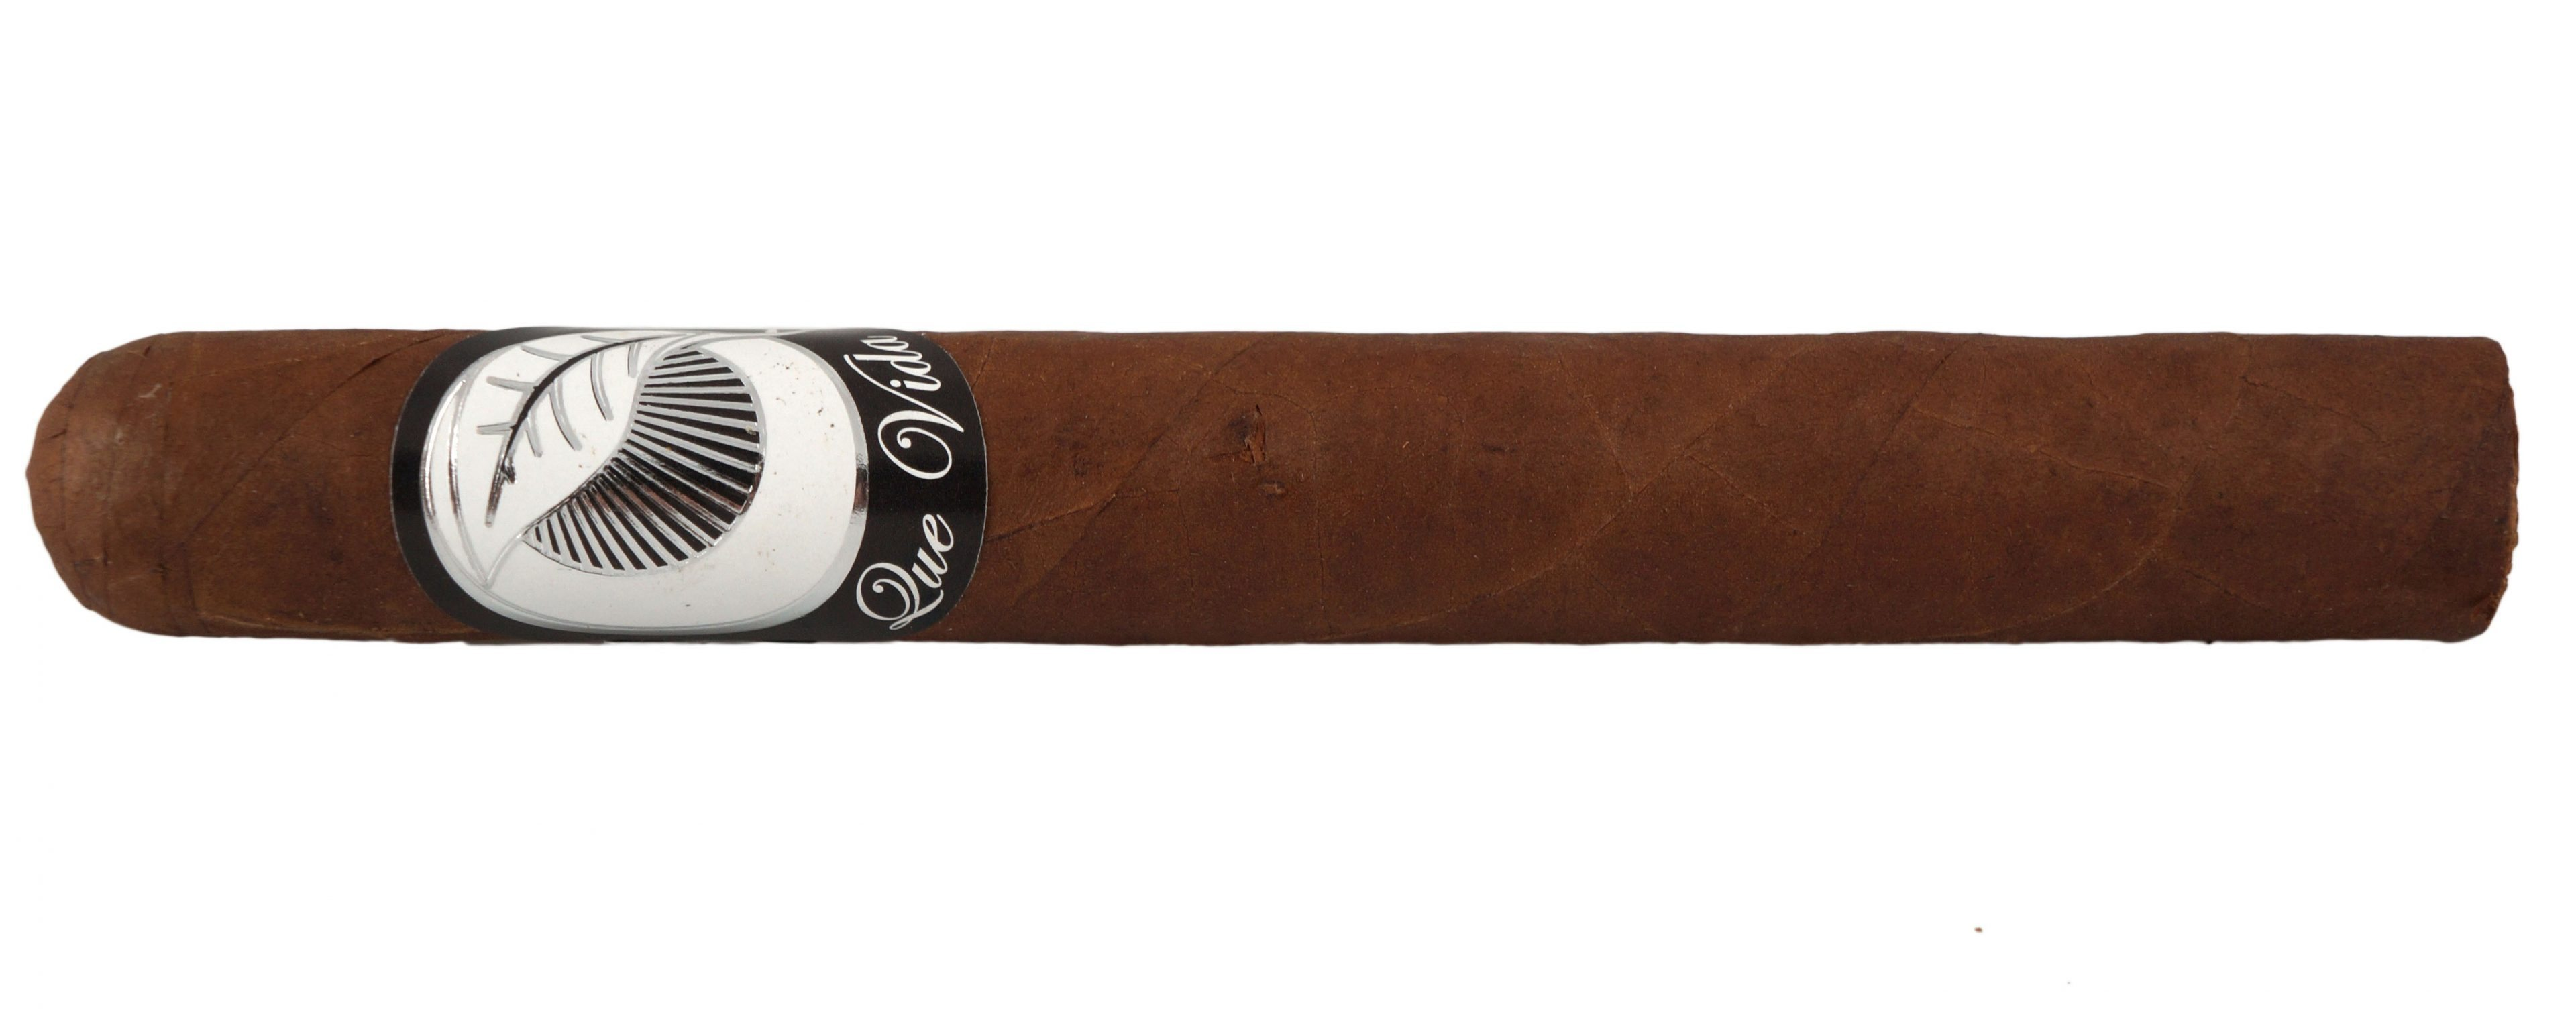 Blind Cigar Review: Que Vida | Toro